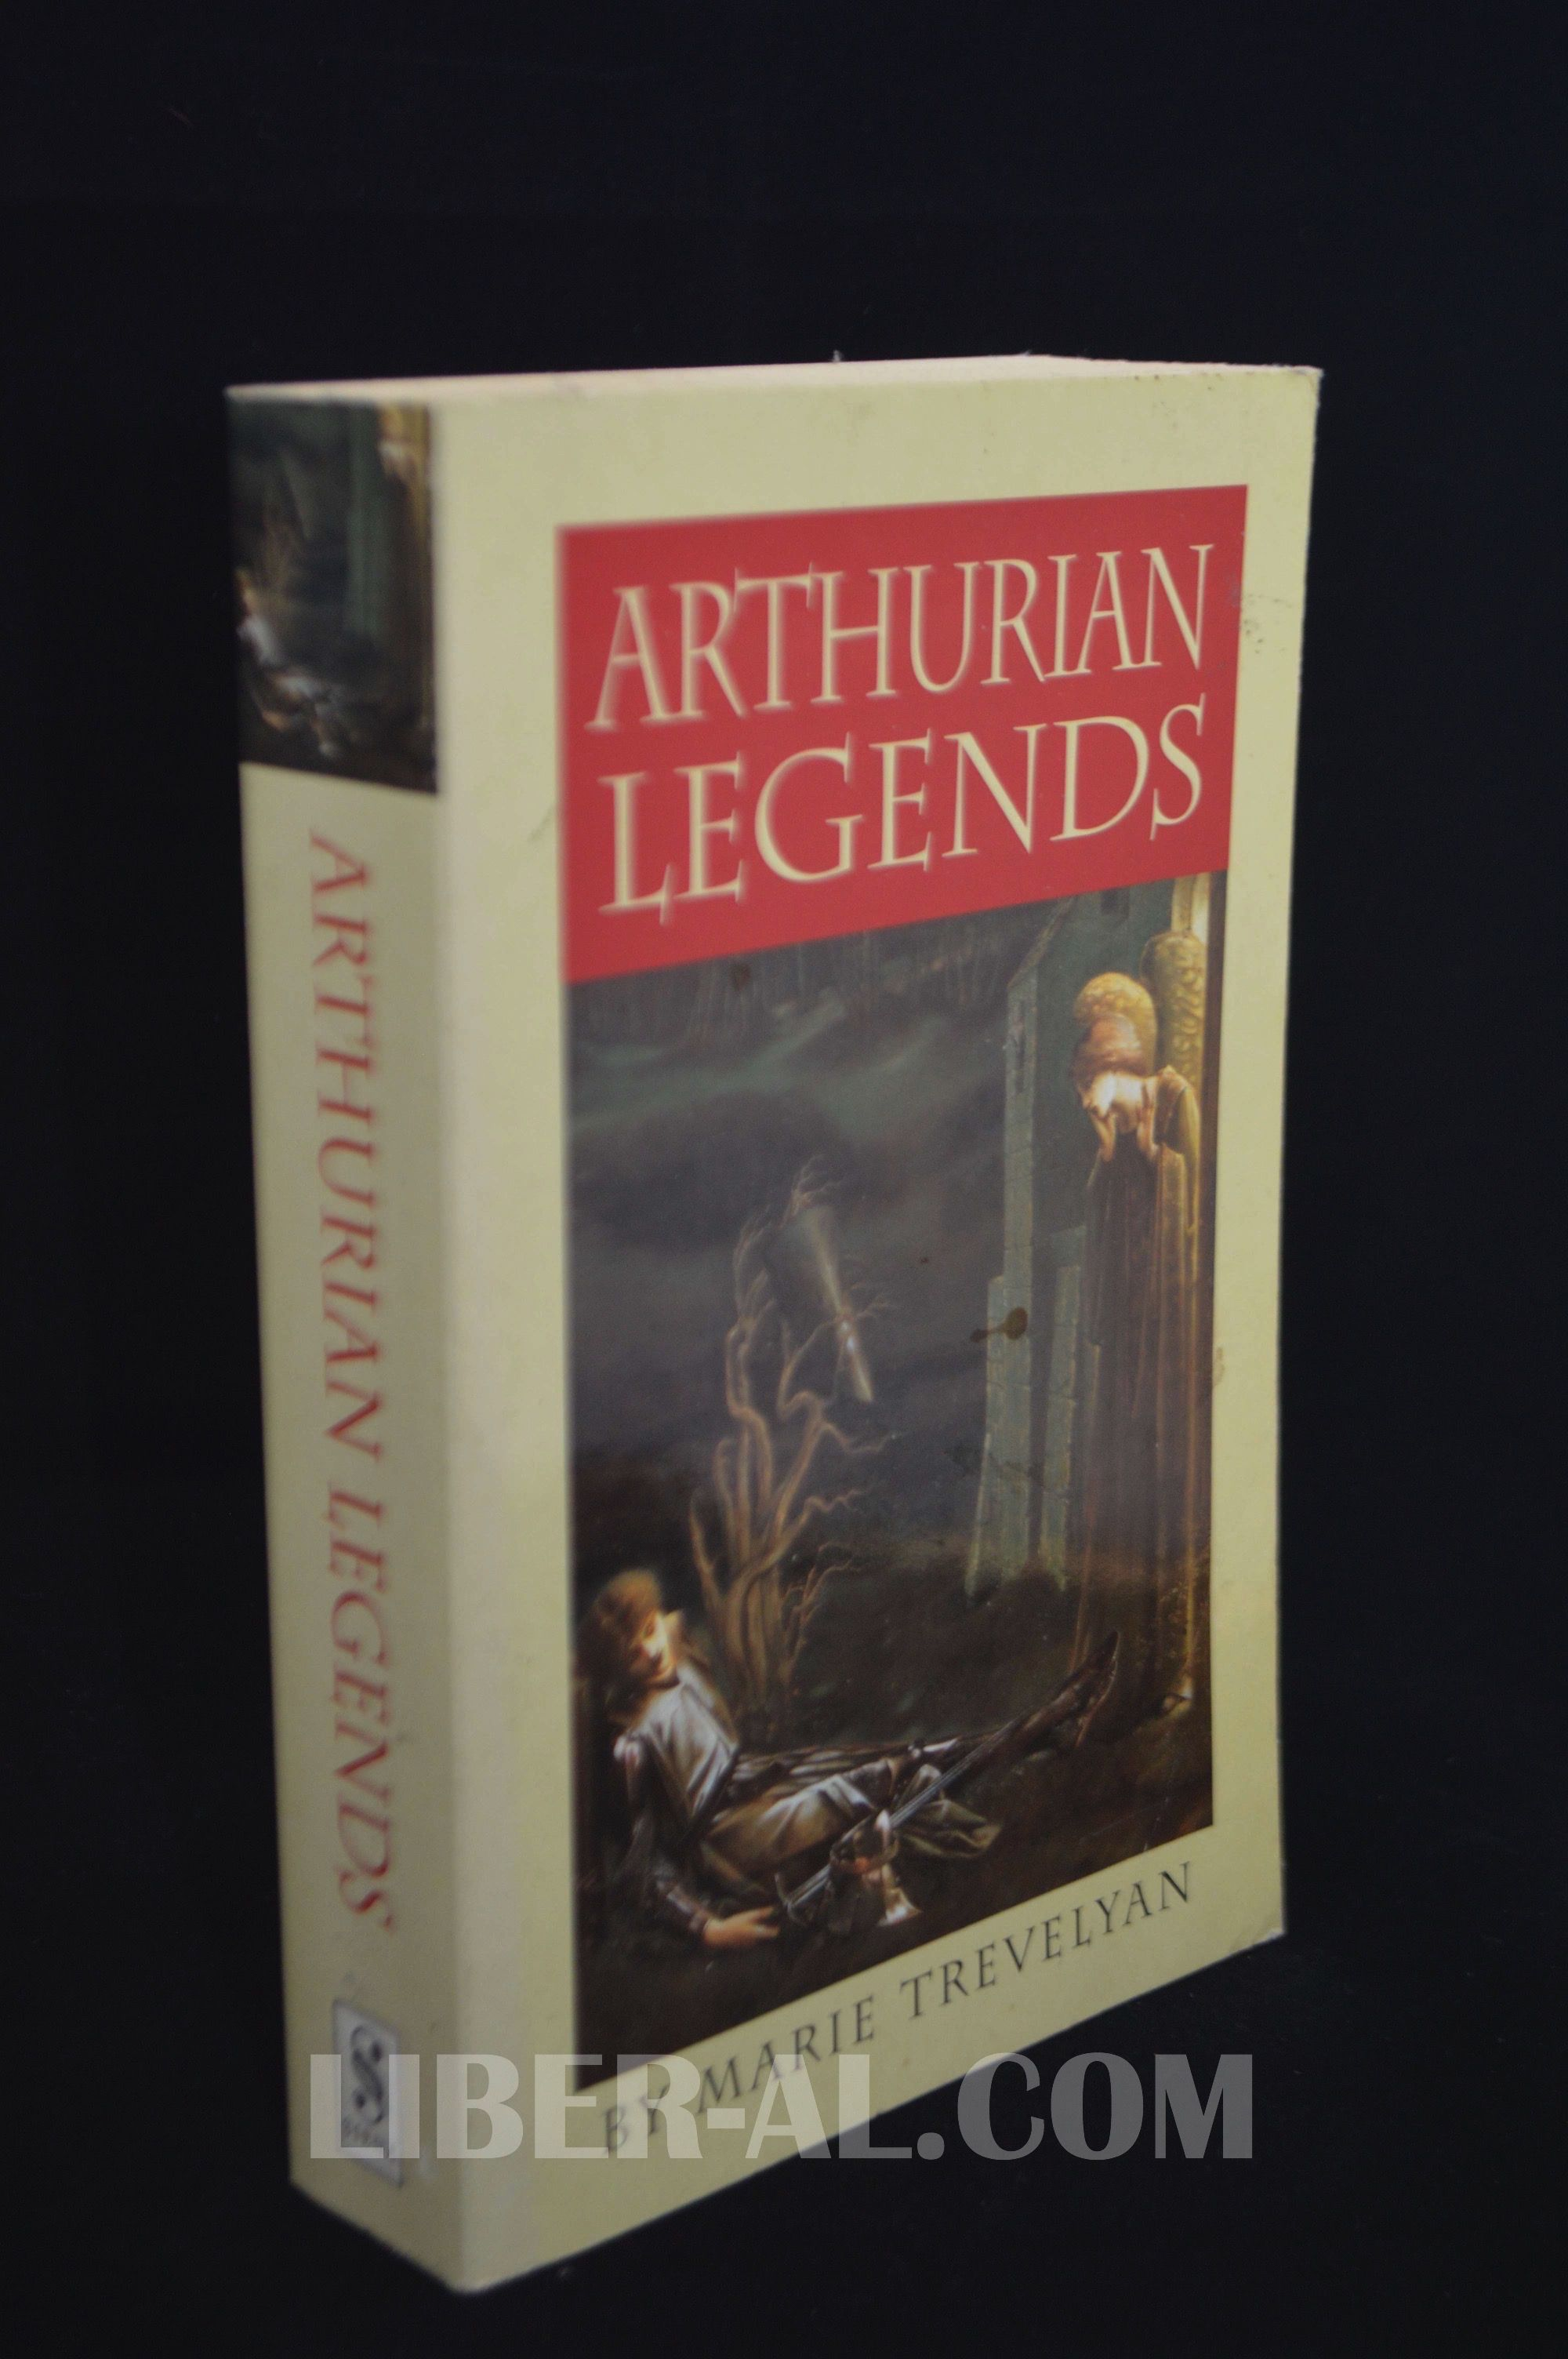 Arthurian Legends The Land Of Arthur Its Heroes And Heroines Liber Al Com Arthurian Legend Legend Of King Arthurian